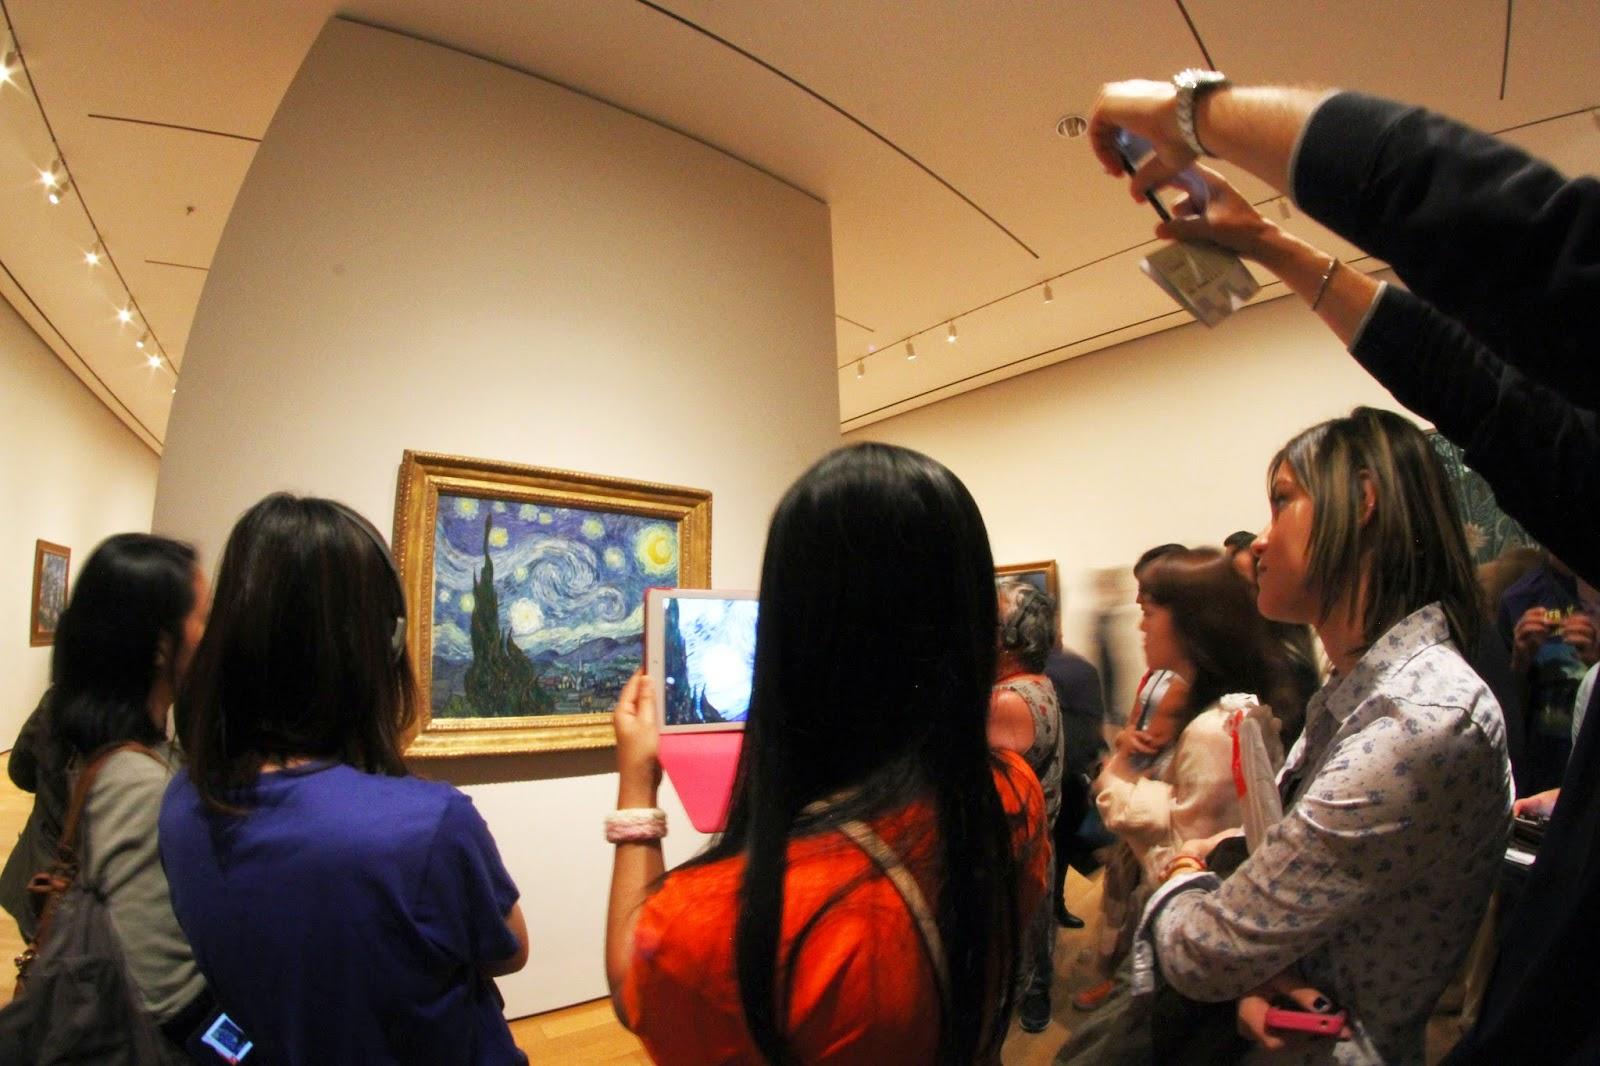 VISITAR o MOMA - O Museu de Arte Moderna, ou MoMA (para os amigos!) | EUA